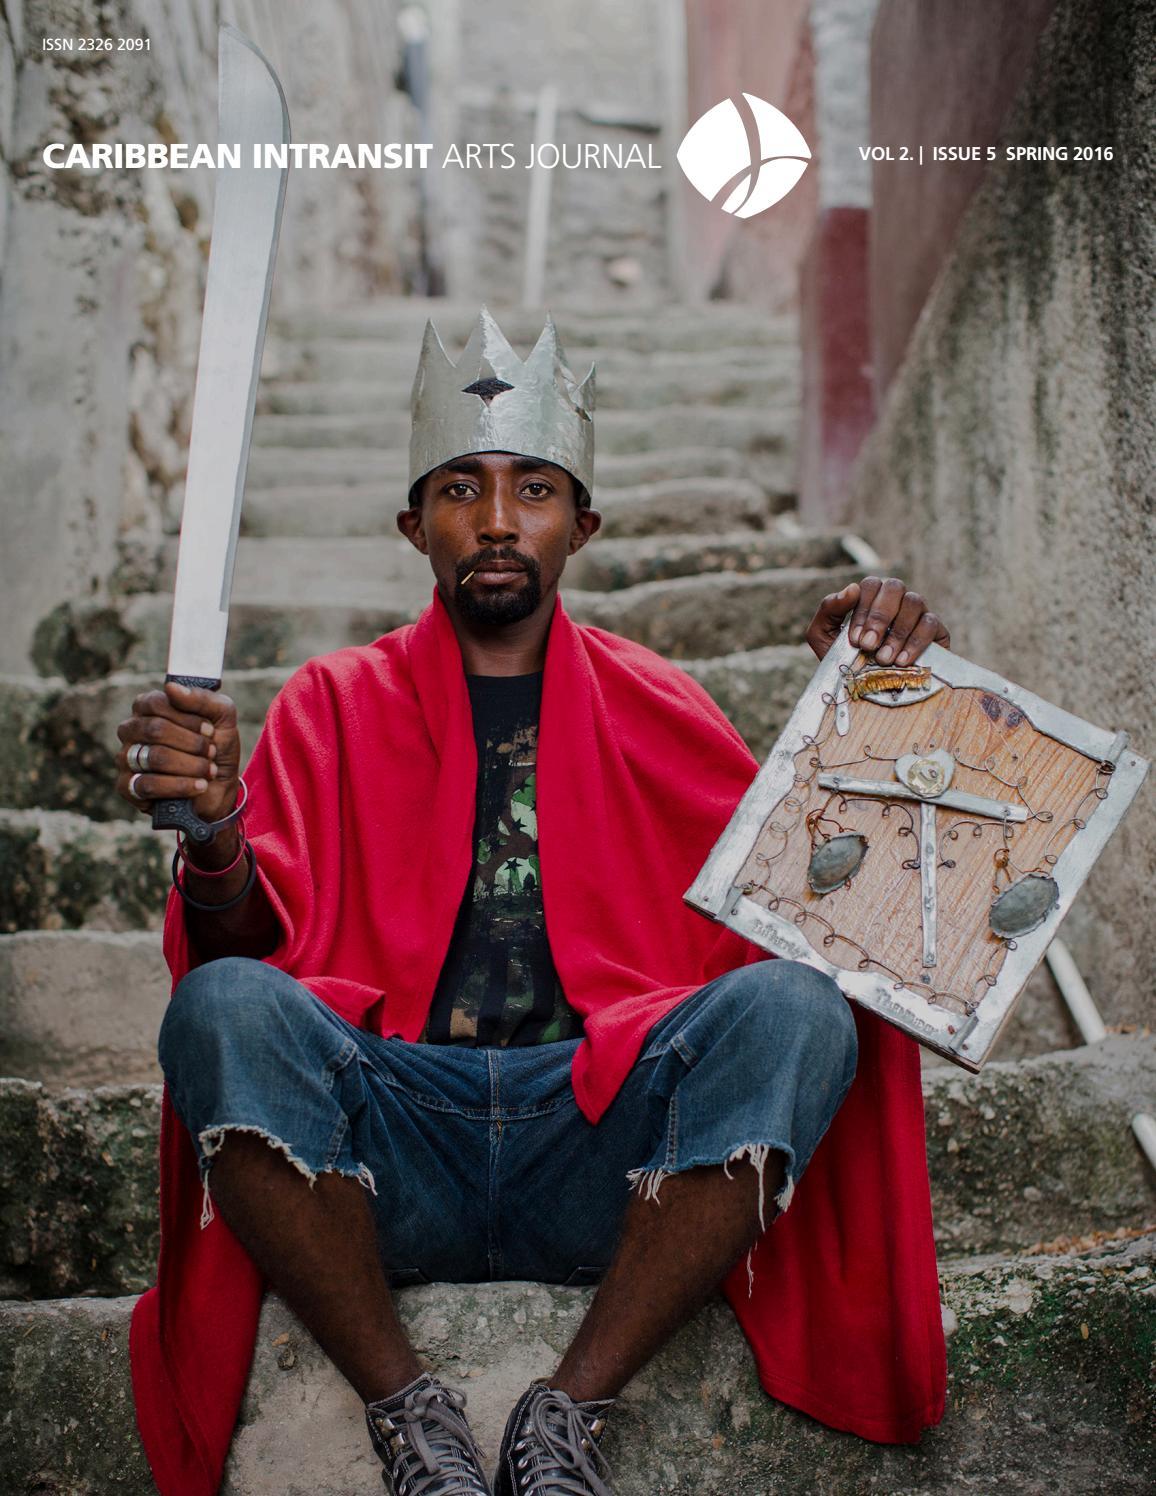 Caribbean Intransit | Volume 2 Issue 5 by Keisha Oliver - issuu